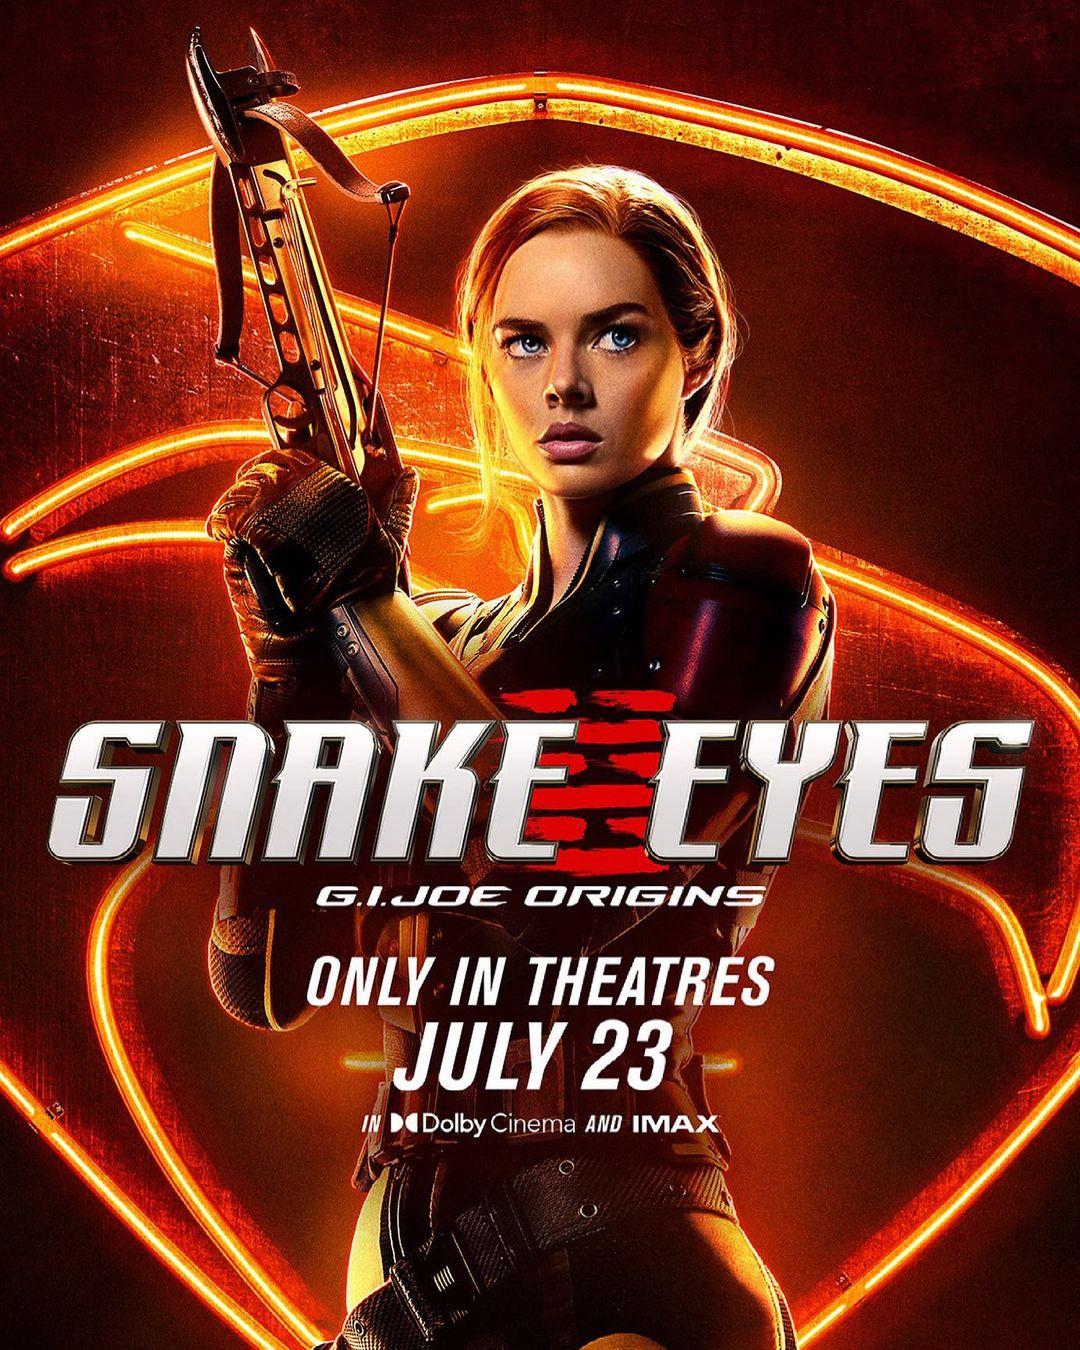 Samara Weaving plays Scarlett in Snake Eyes: G.I. Joe Origins.